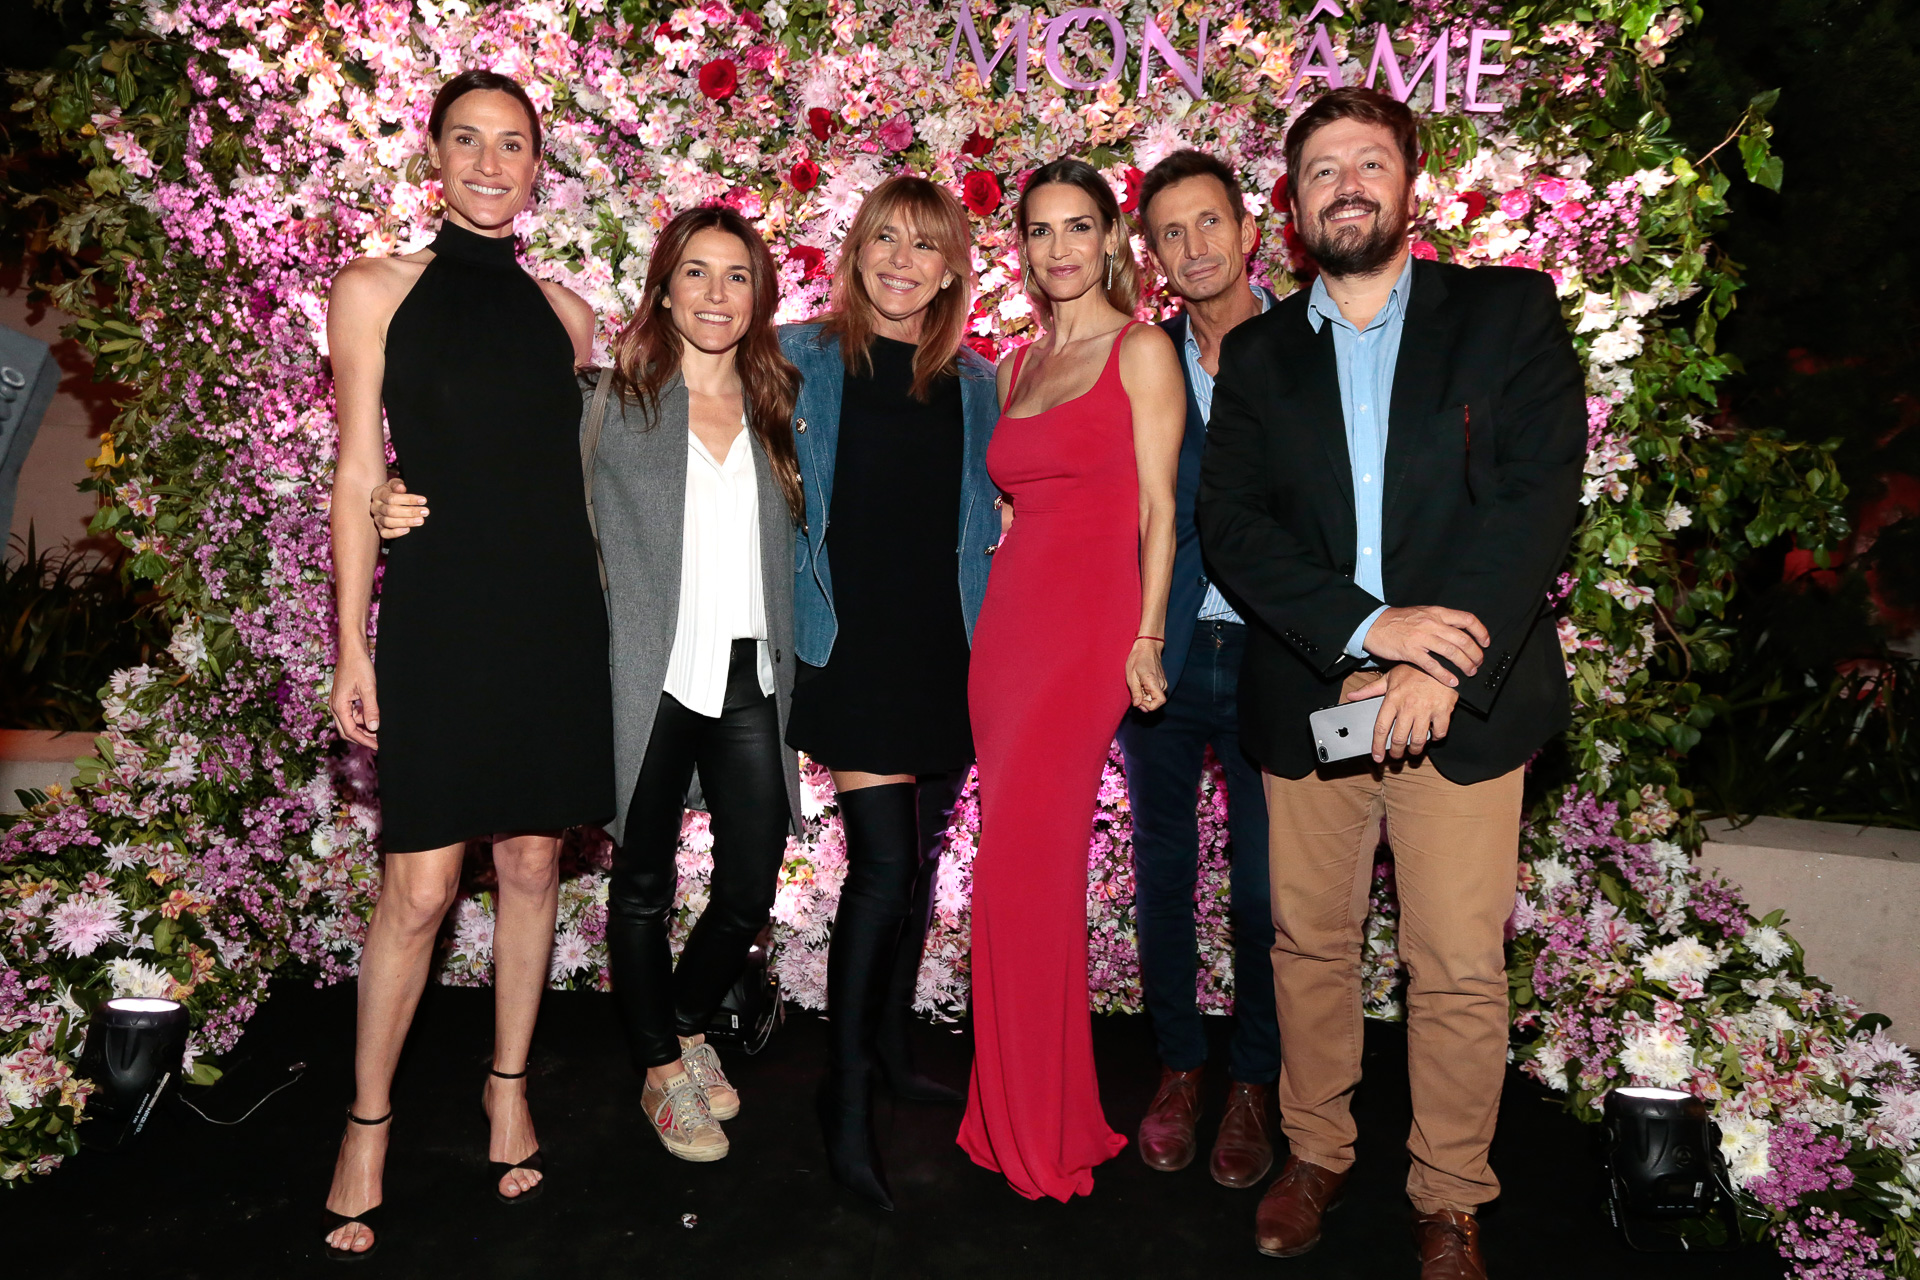 Lara Bernasconi, Vicky Miranda, Grace Ratto, María Vázquez, Martín Arozamena y Jorge Lukowski